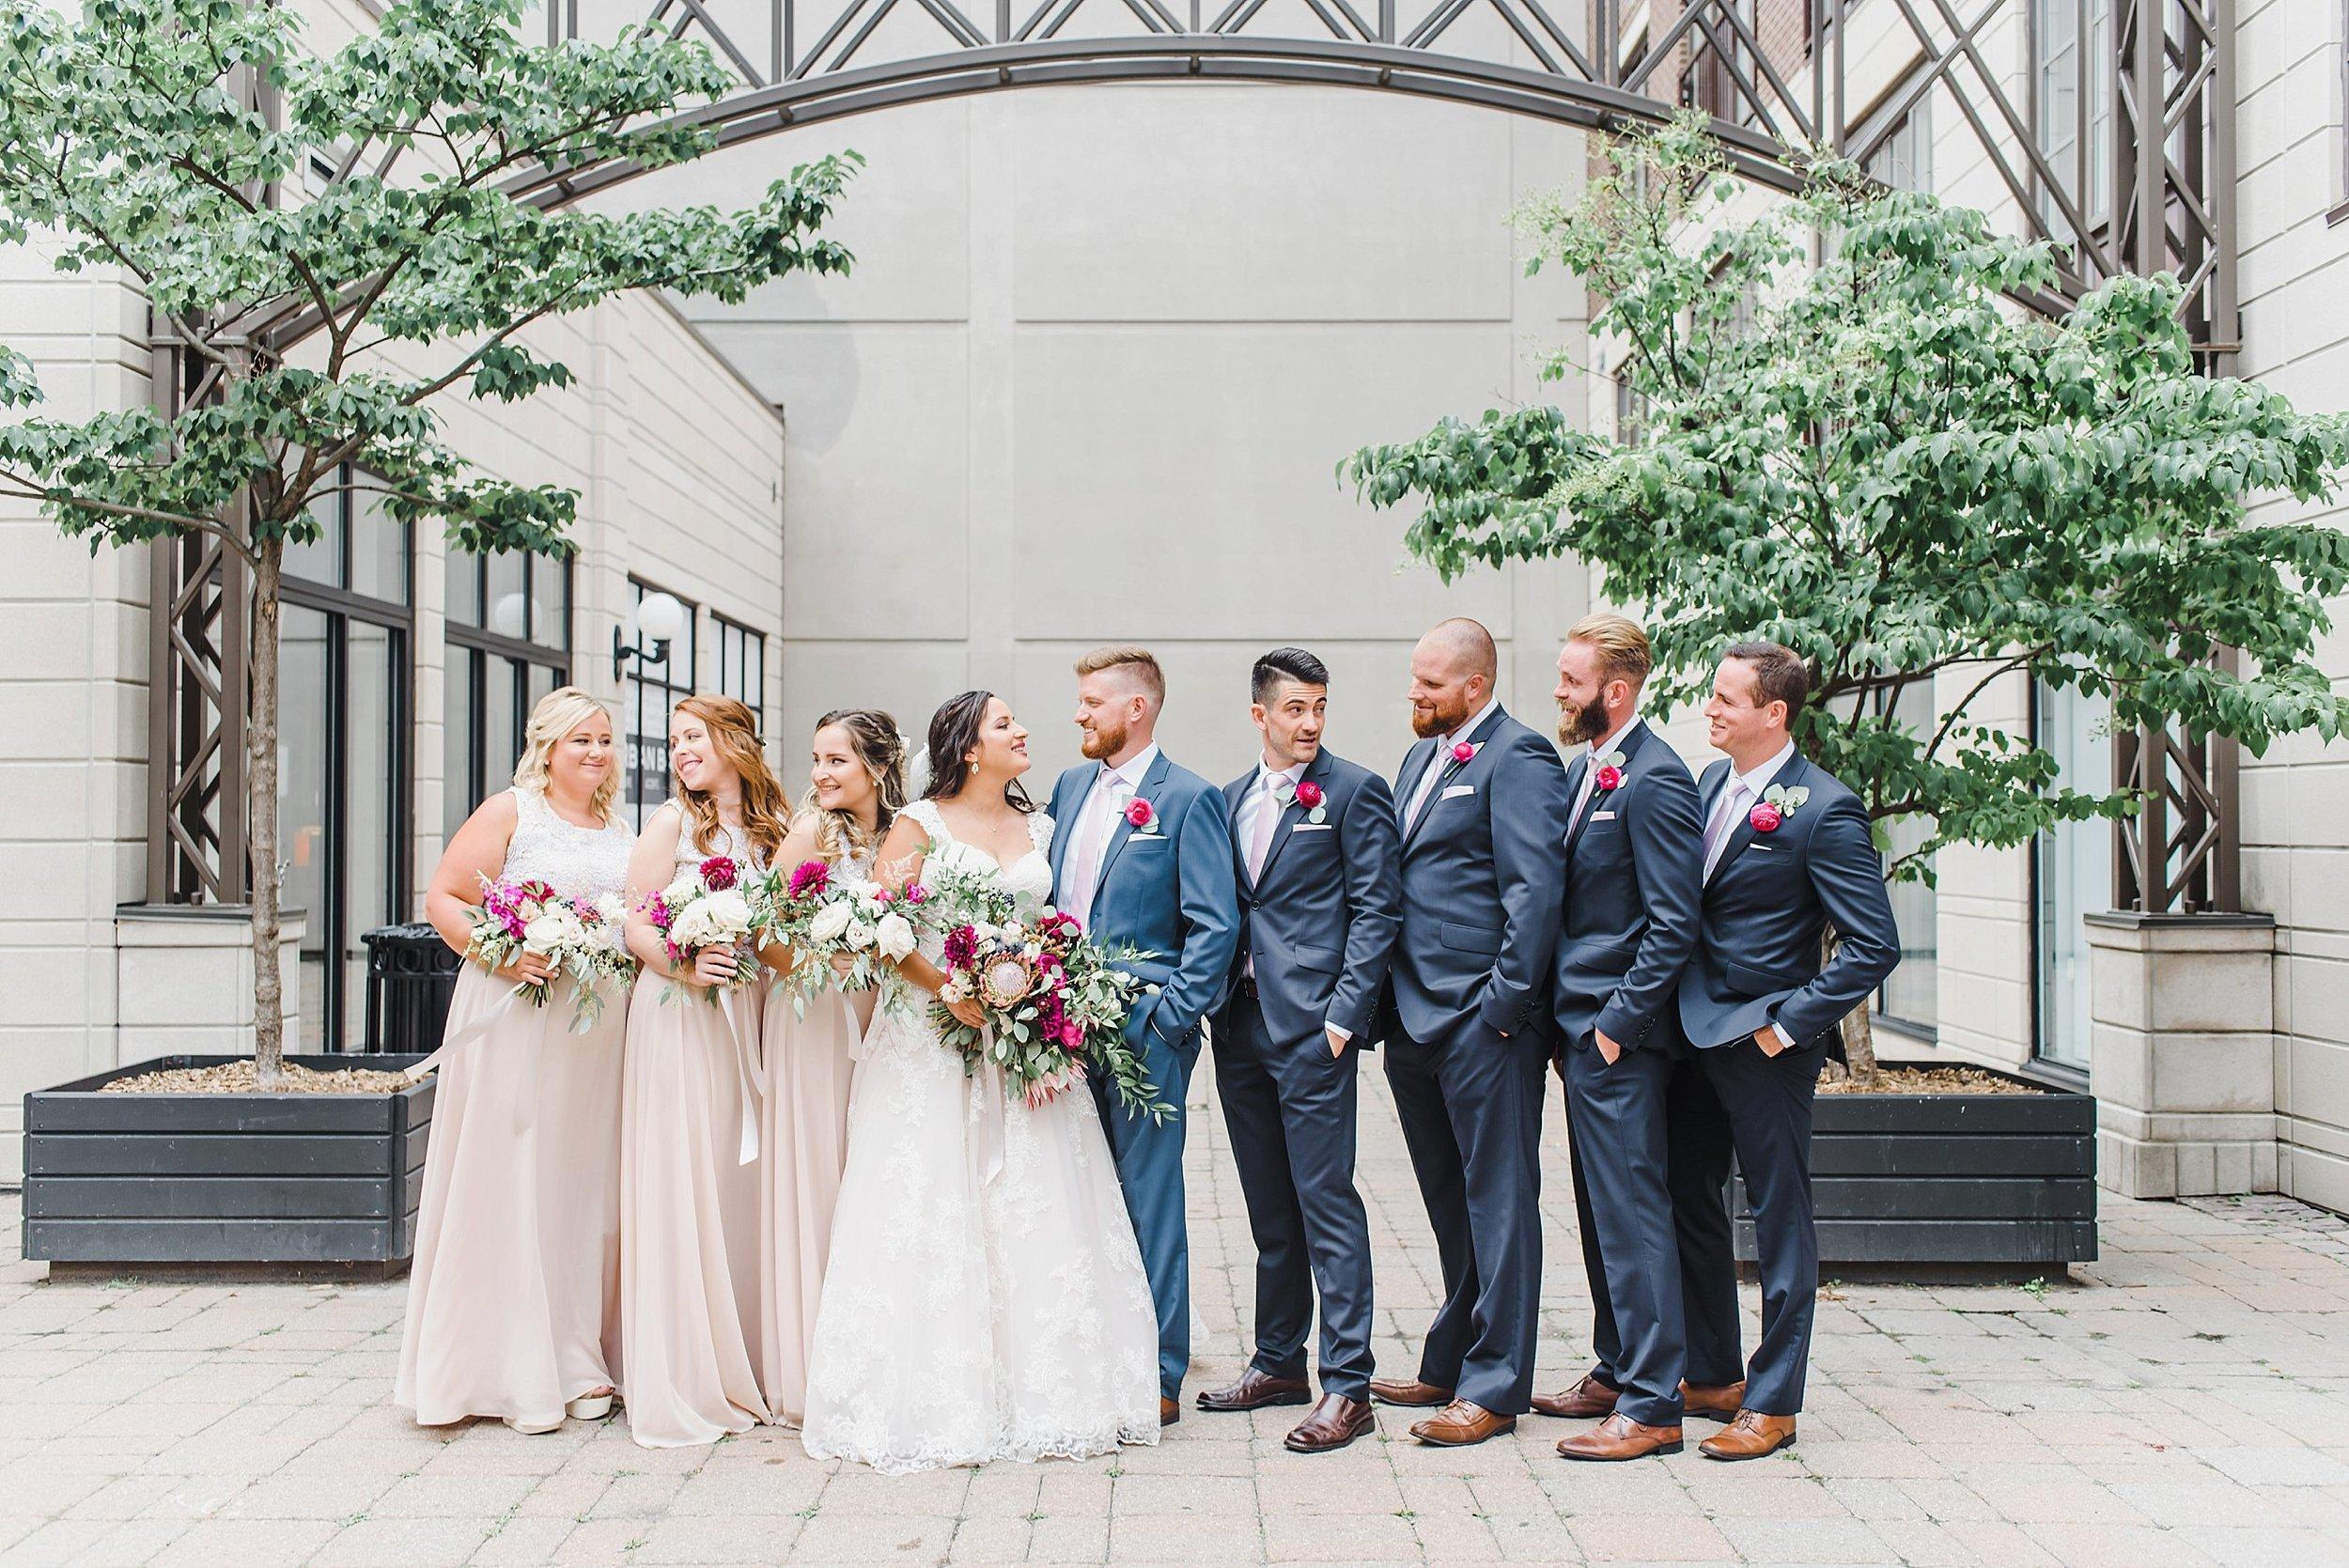 light airy indie fine art ottawa wedding photographer | Ali and Batoul Photography_1608.jpg